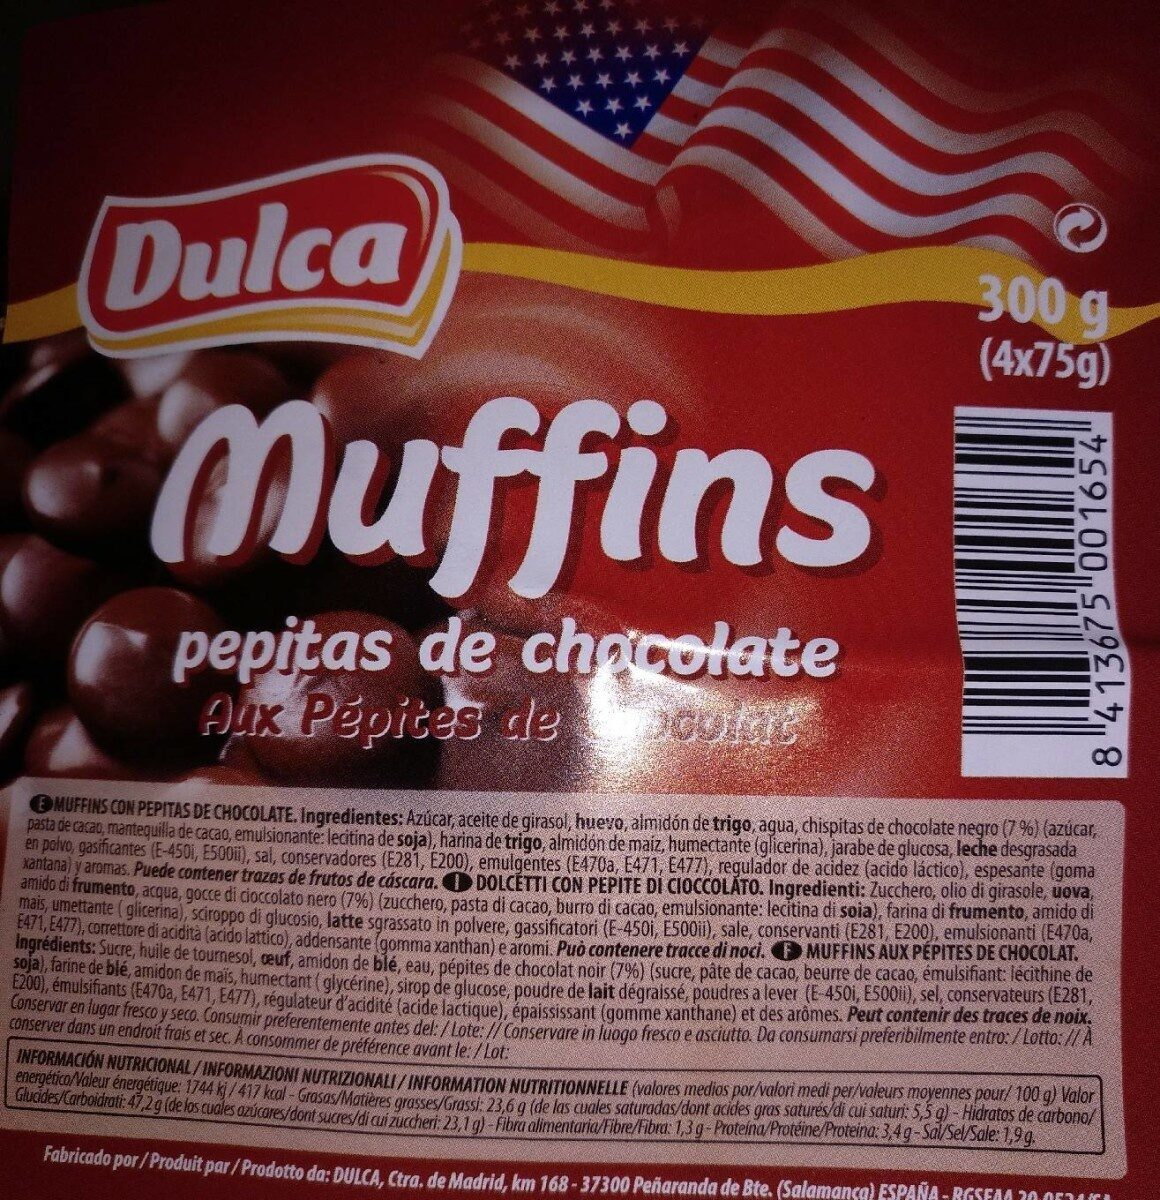 Muffins pepitas de chocolate - Produit - es